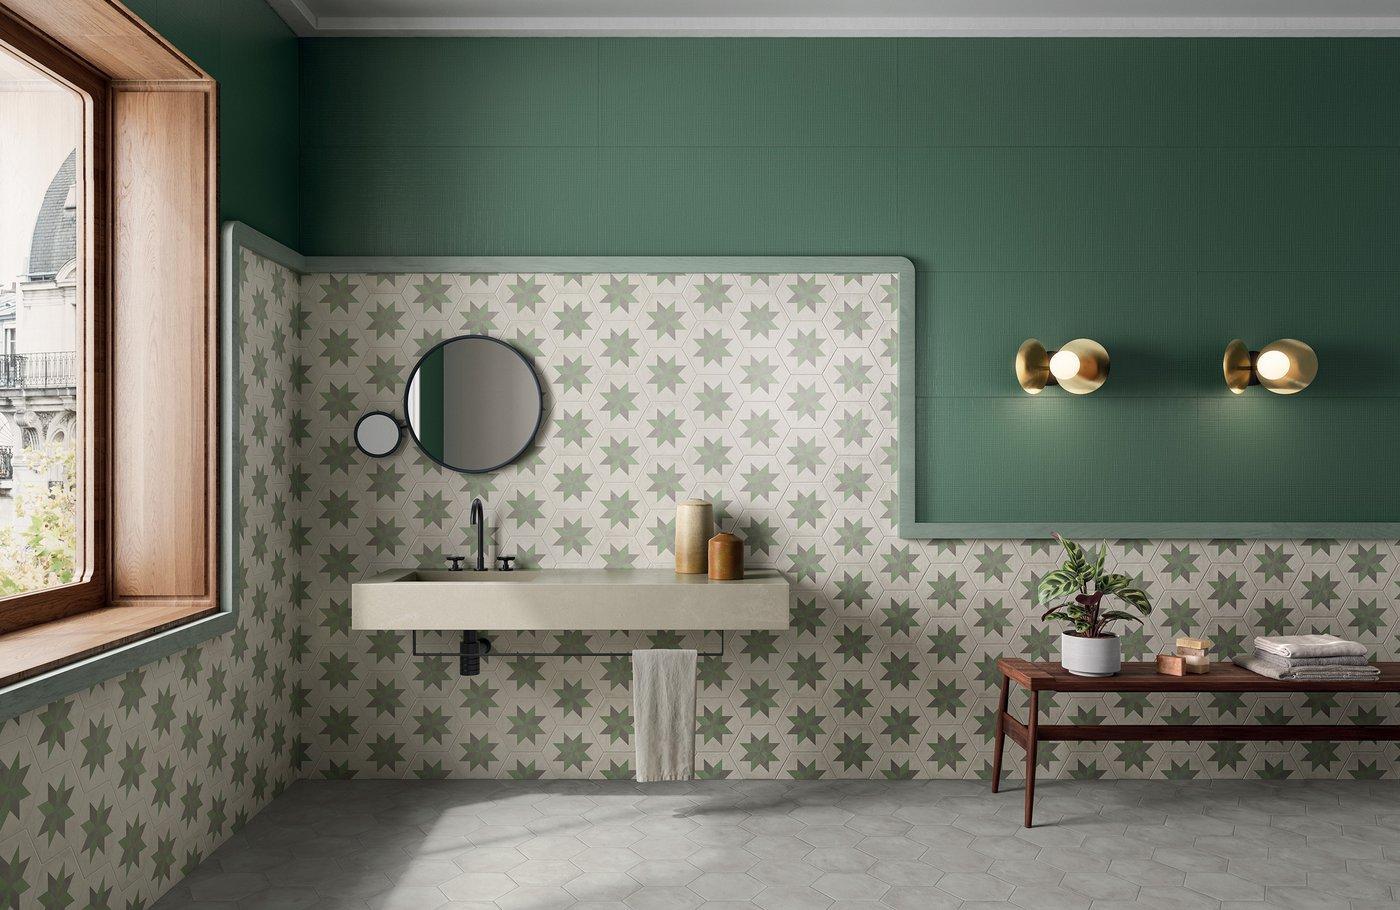 Zelená v kúpeľni - Obrázok č. 2